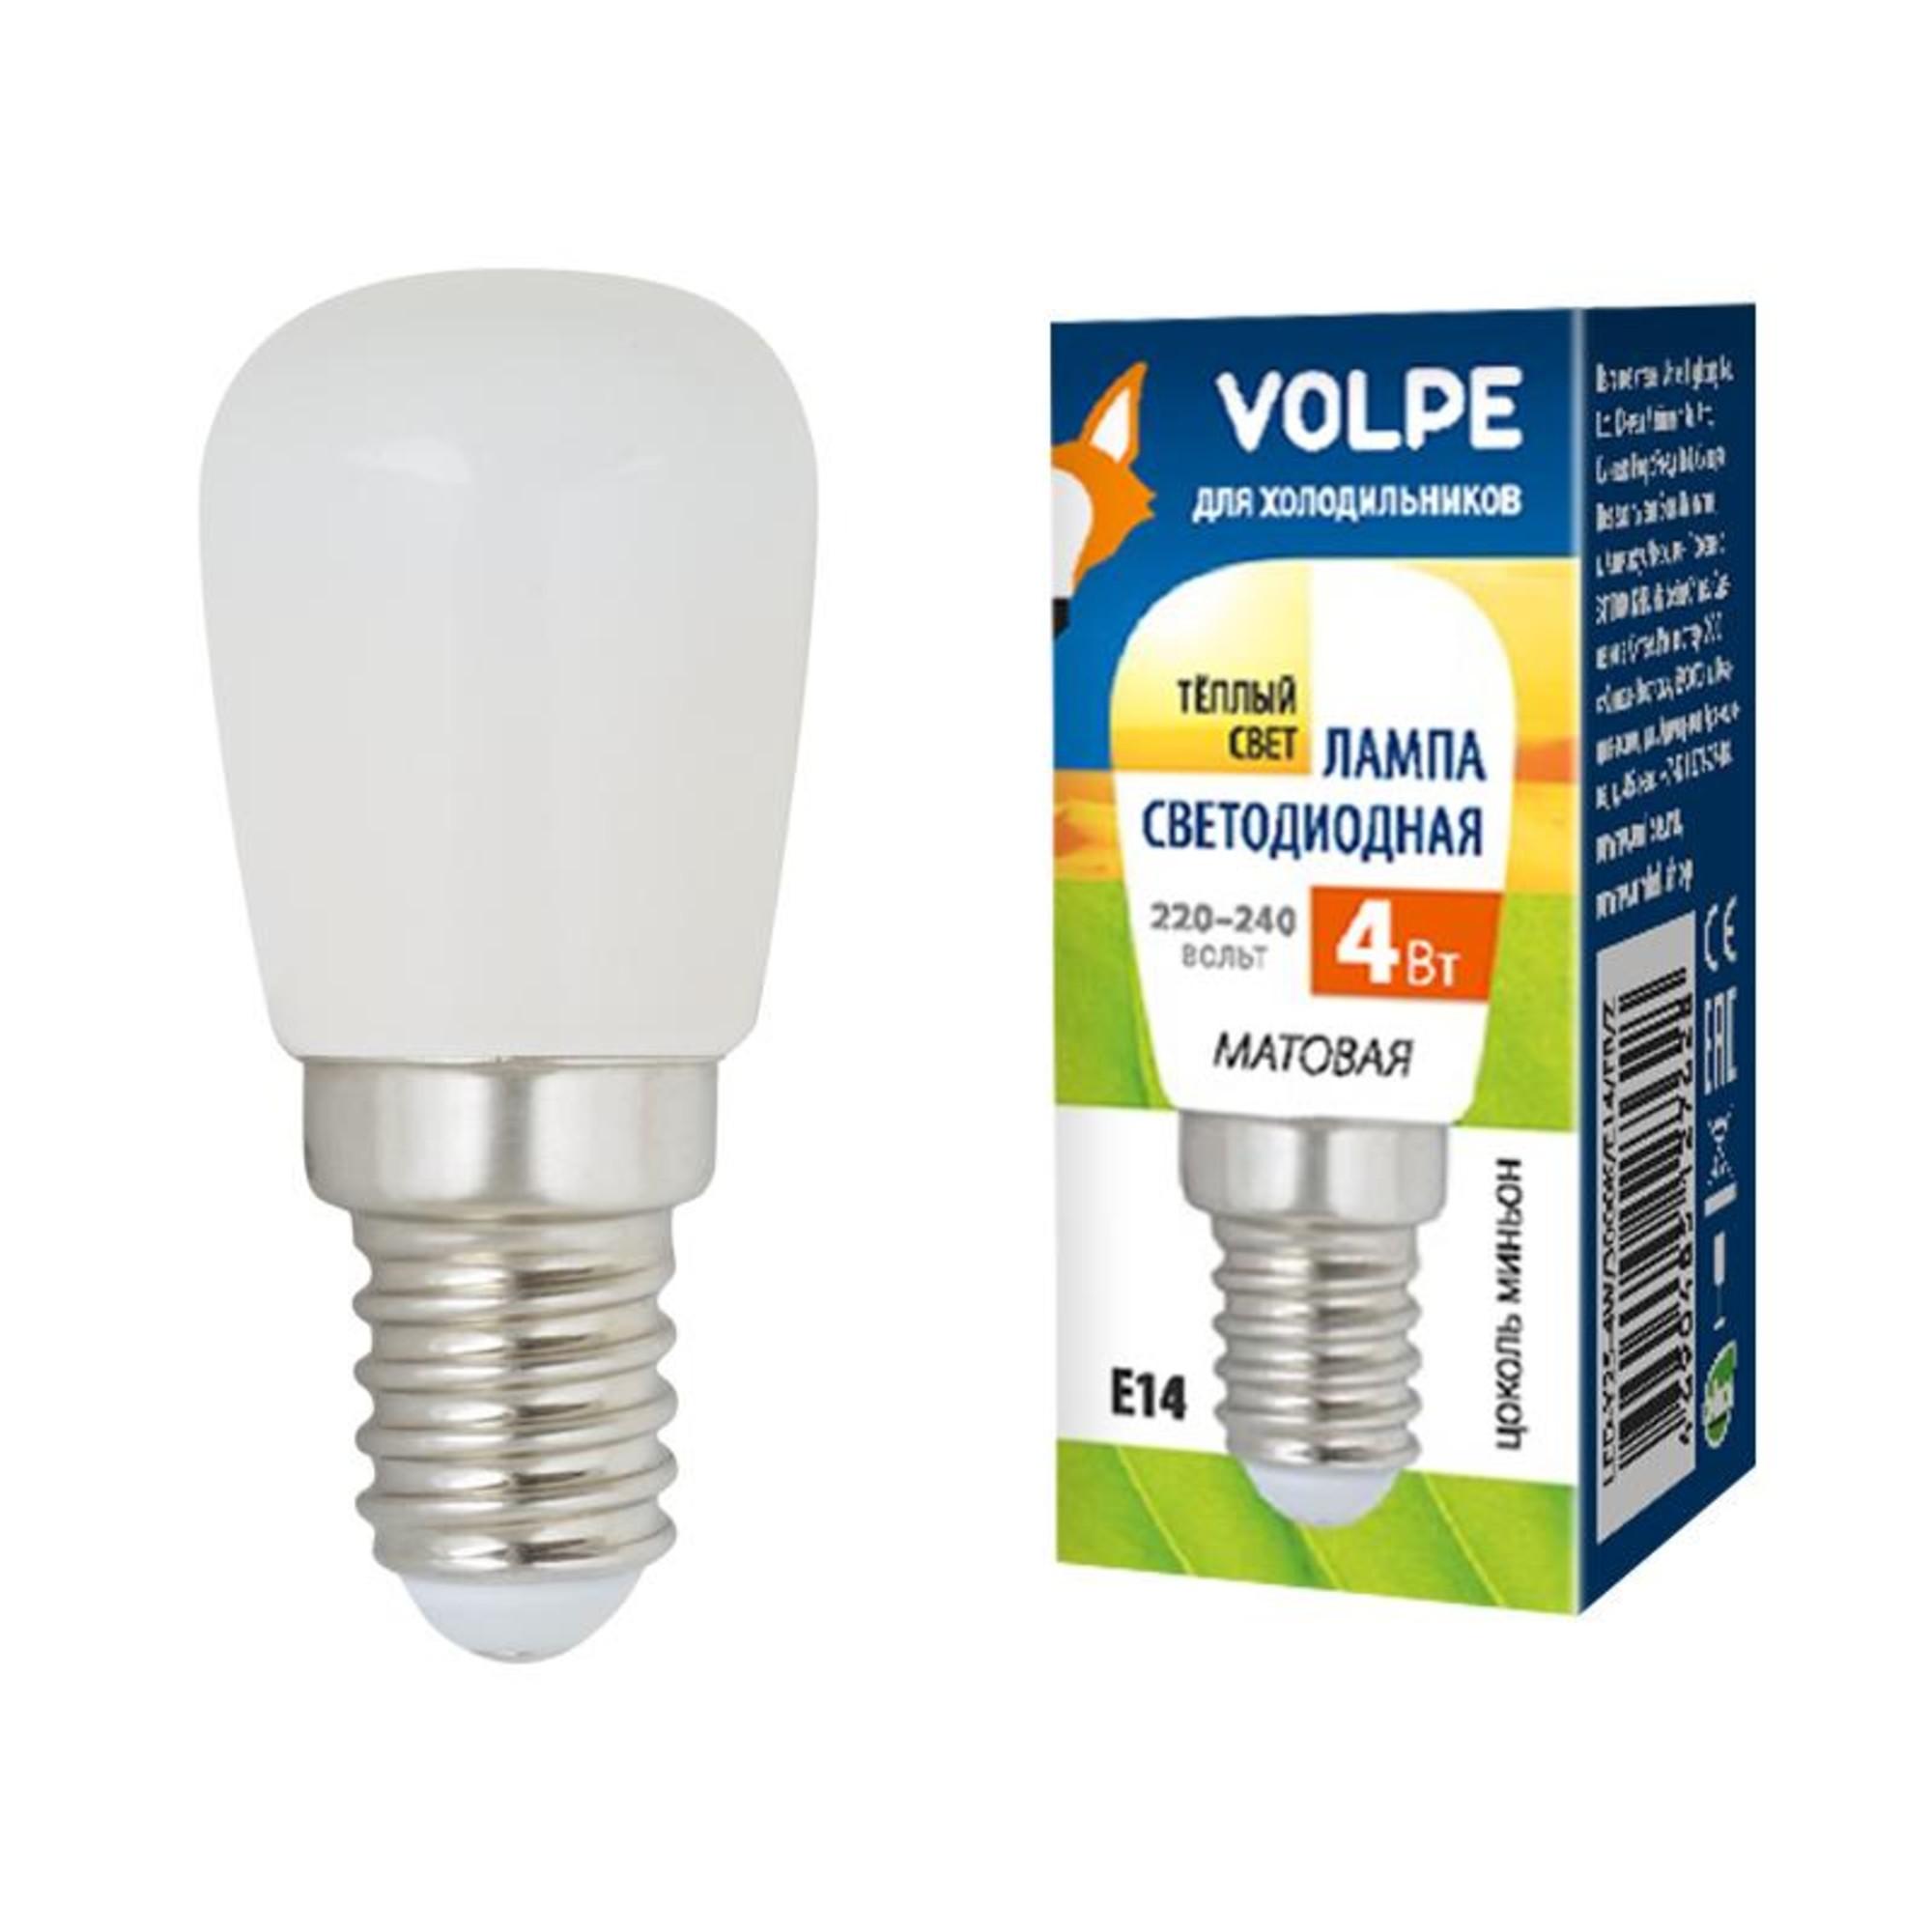 Лампа Volpe светодиодная E14 4 Вт теплый свет